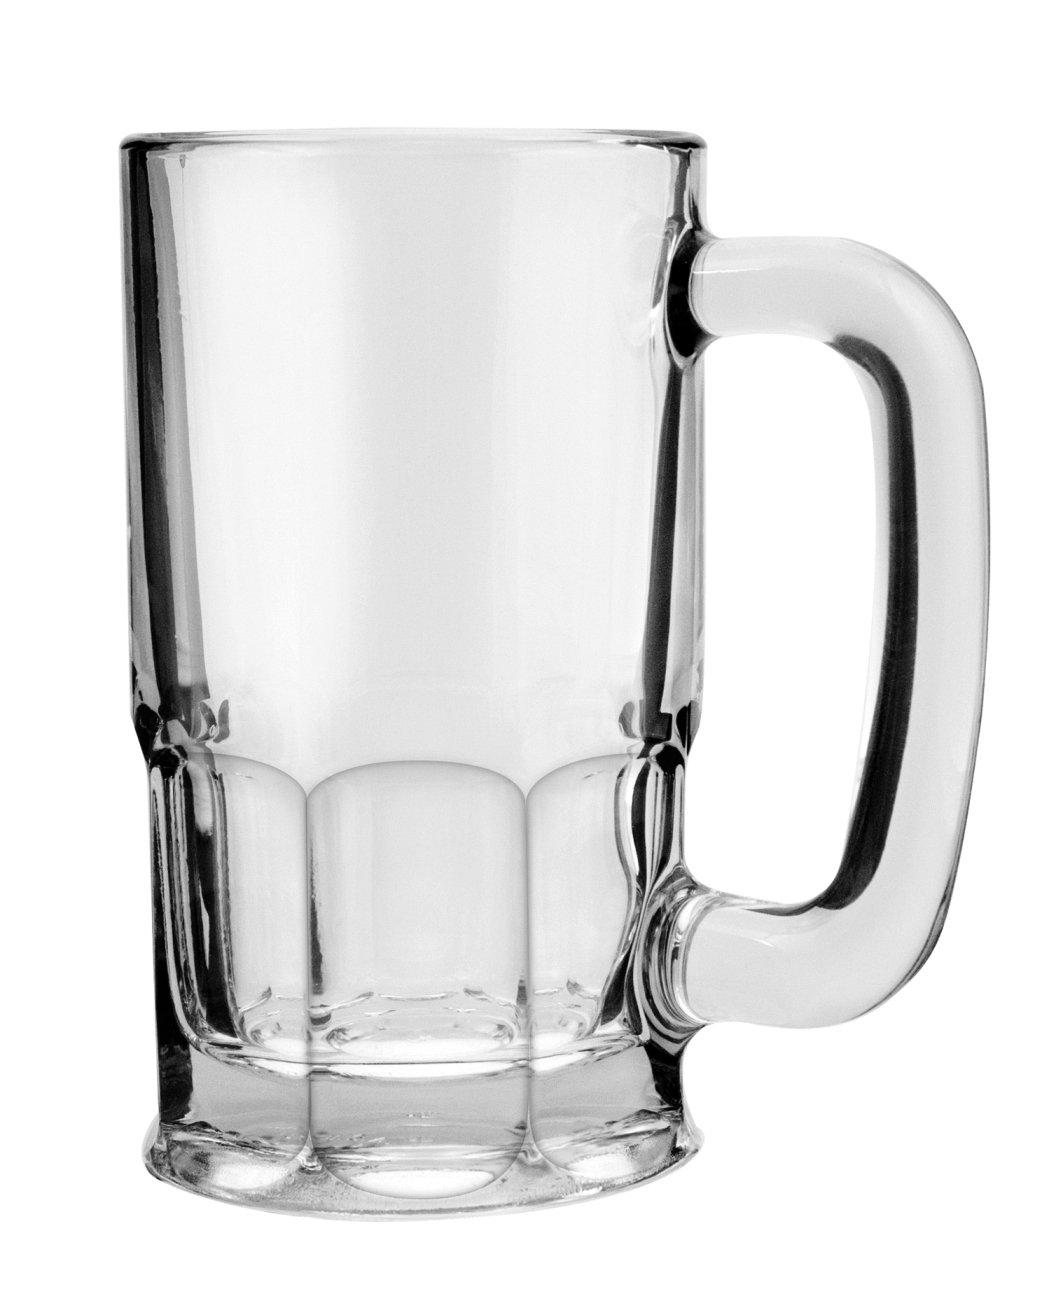 Anchor Hocking 20-Ounce Beer Wagon Mug, Set of 6 93001